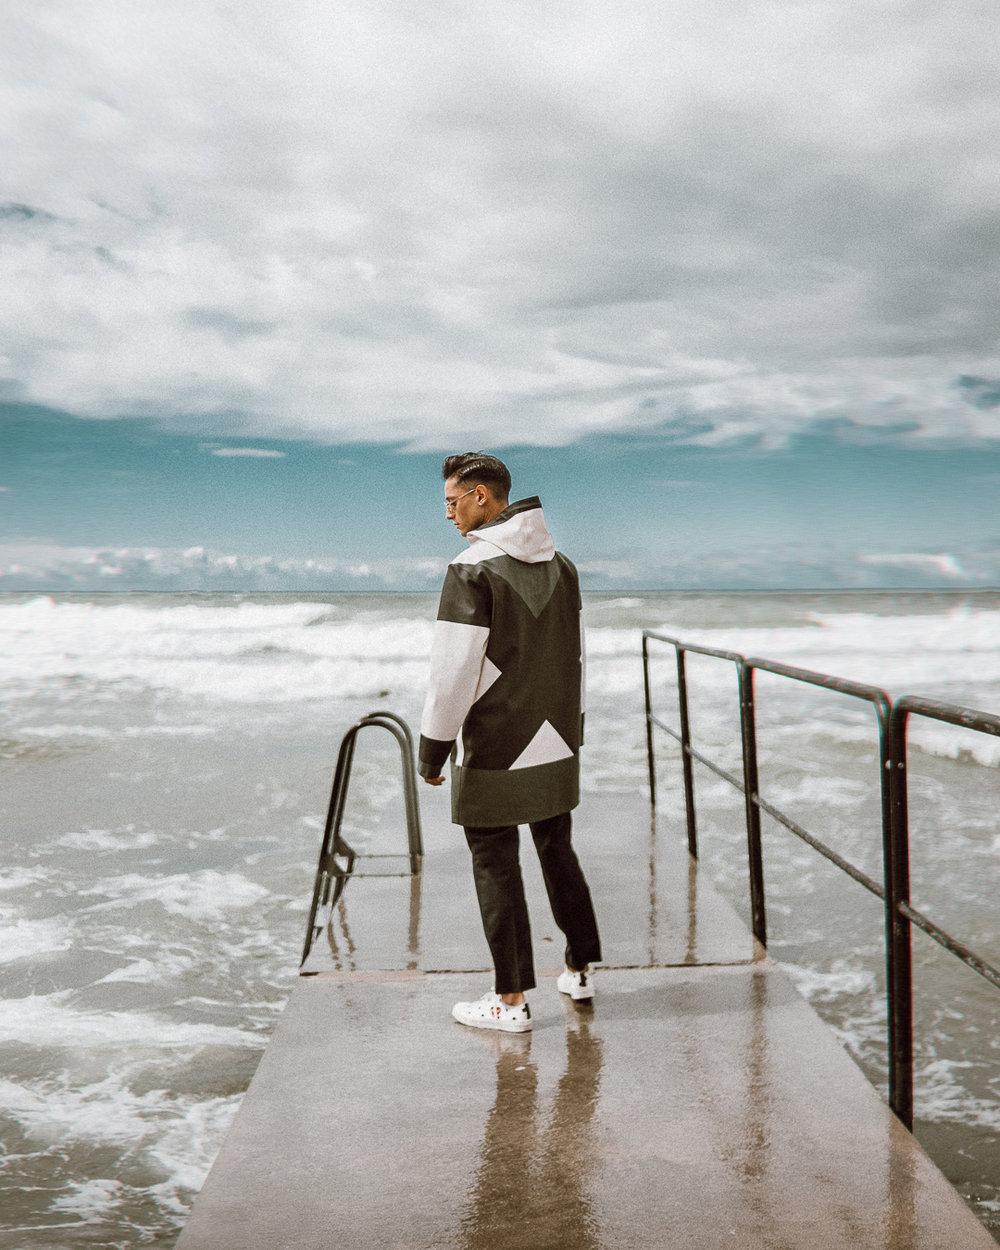 ◎ Wearing Henrik Vibskov X Stutterheim raincoat